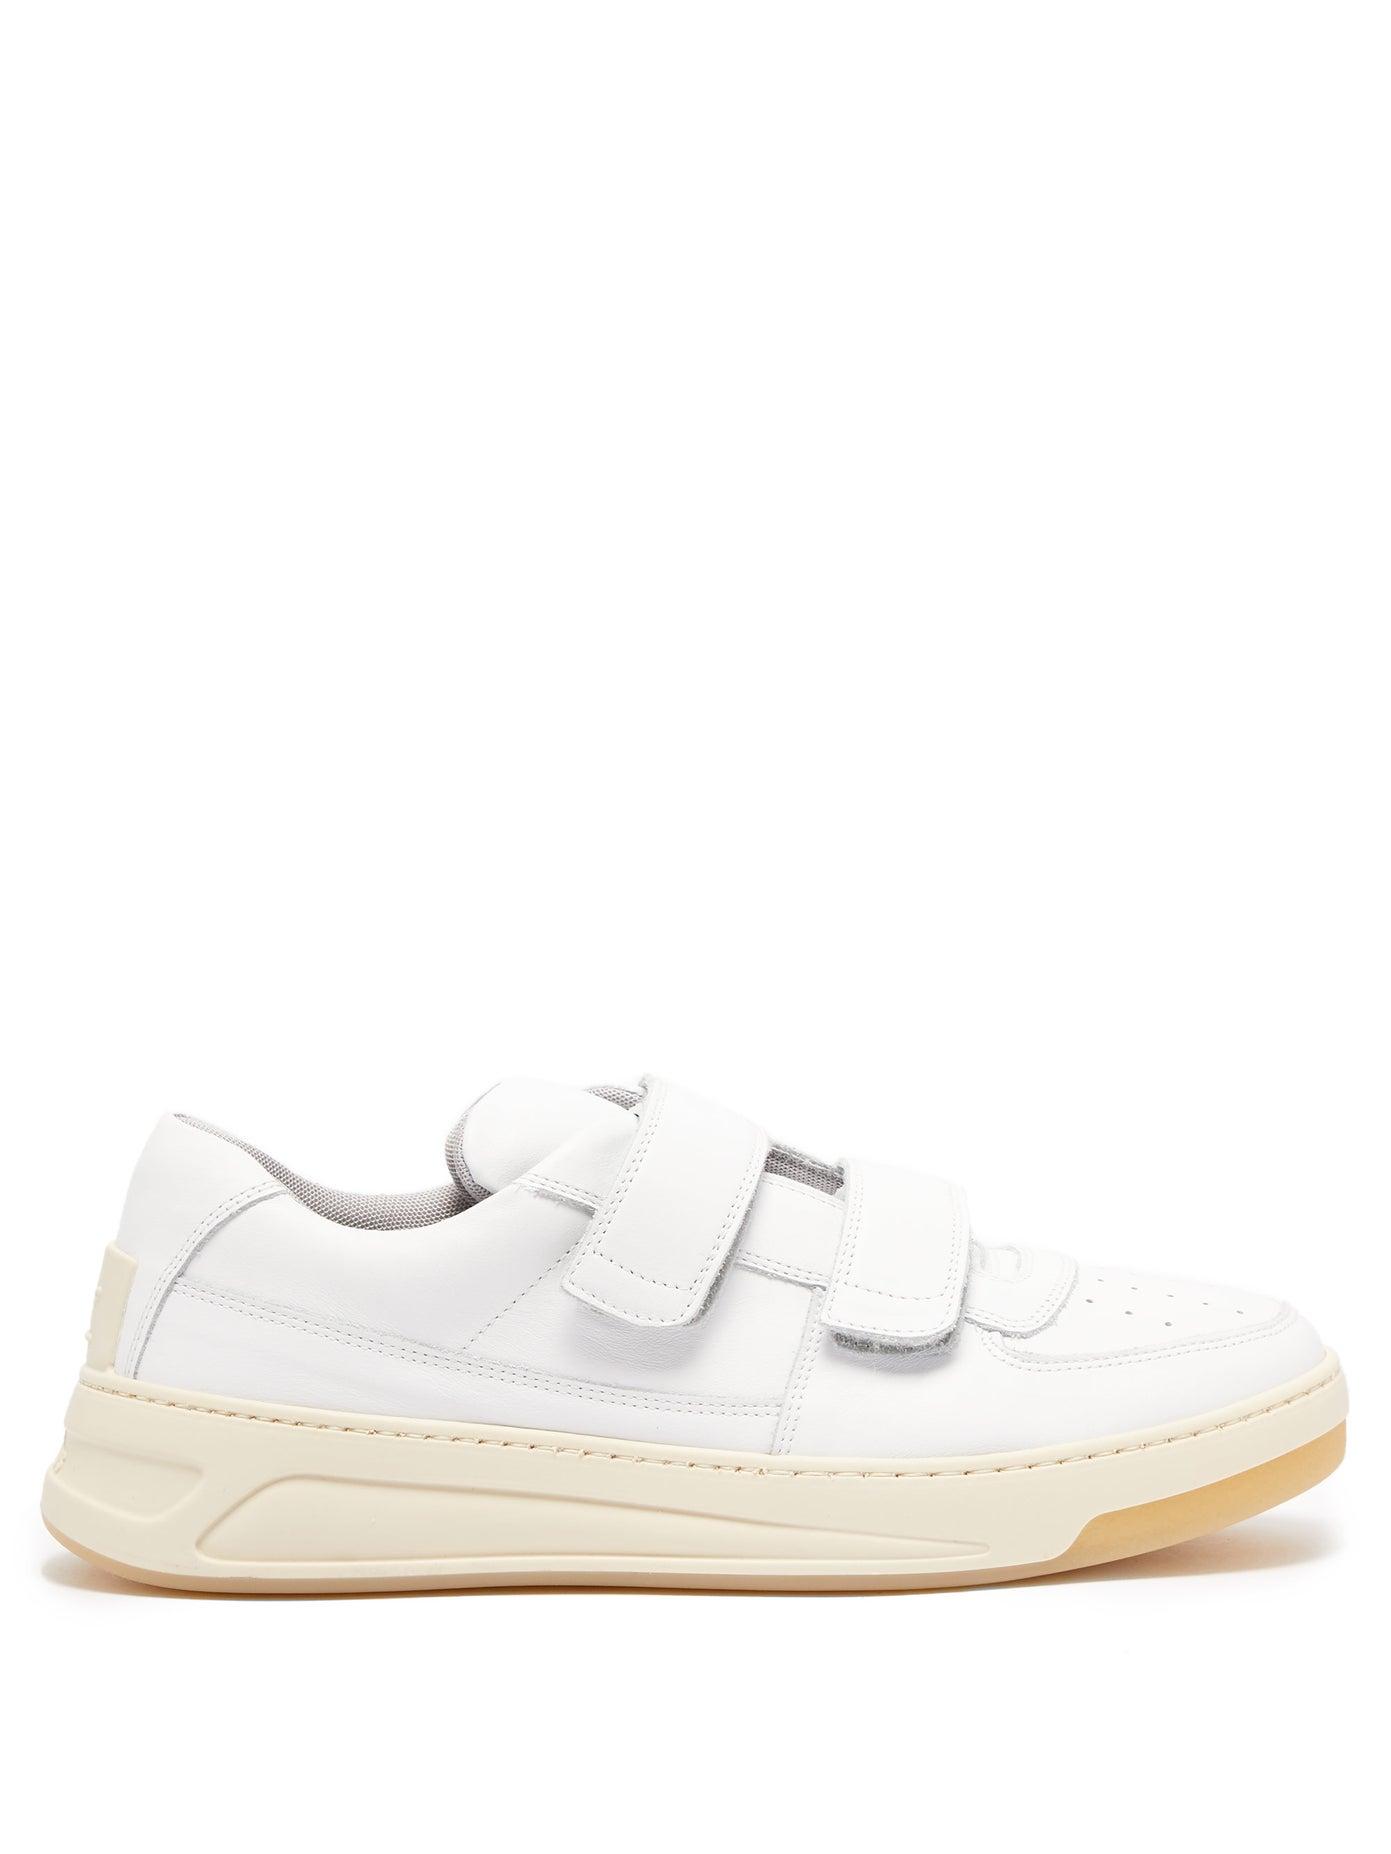 Die besten weißen Sneaker 2020: Acne white sneakers